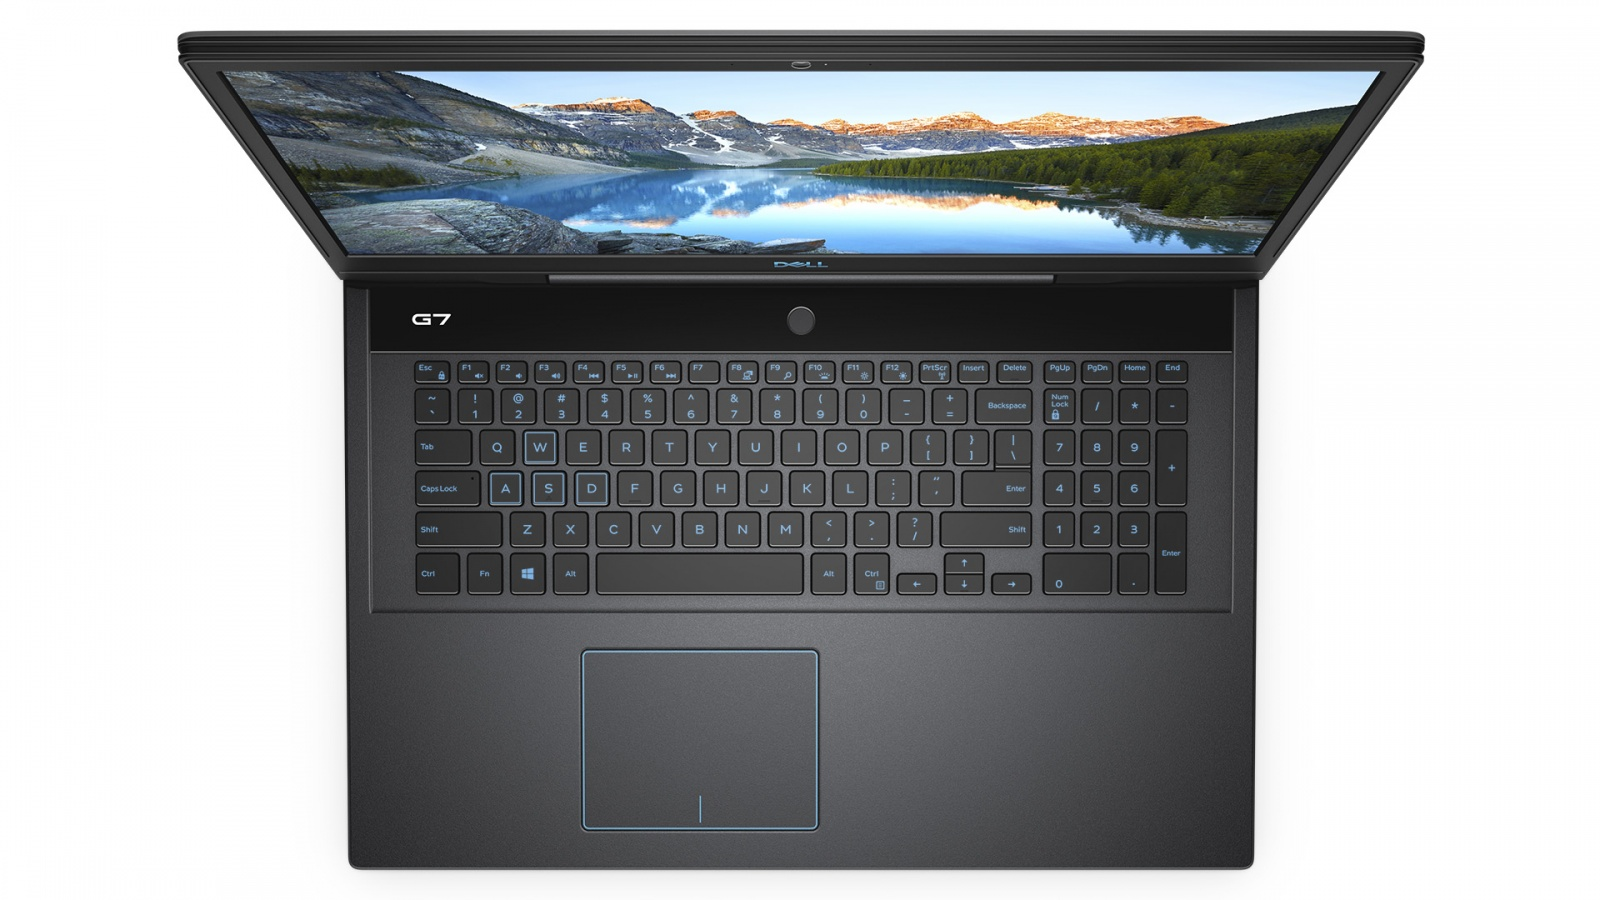 Dell и Alienware на CES 2019: гайд по всем основным новинкам - 19